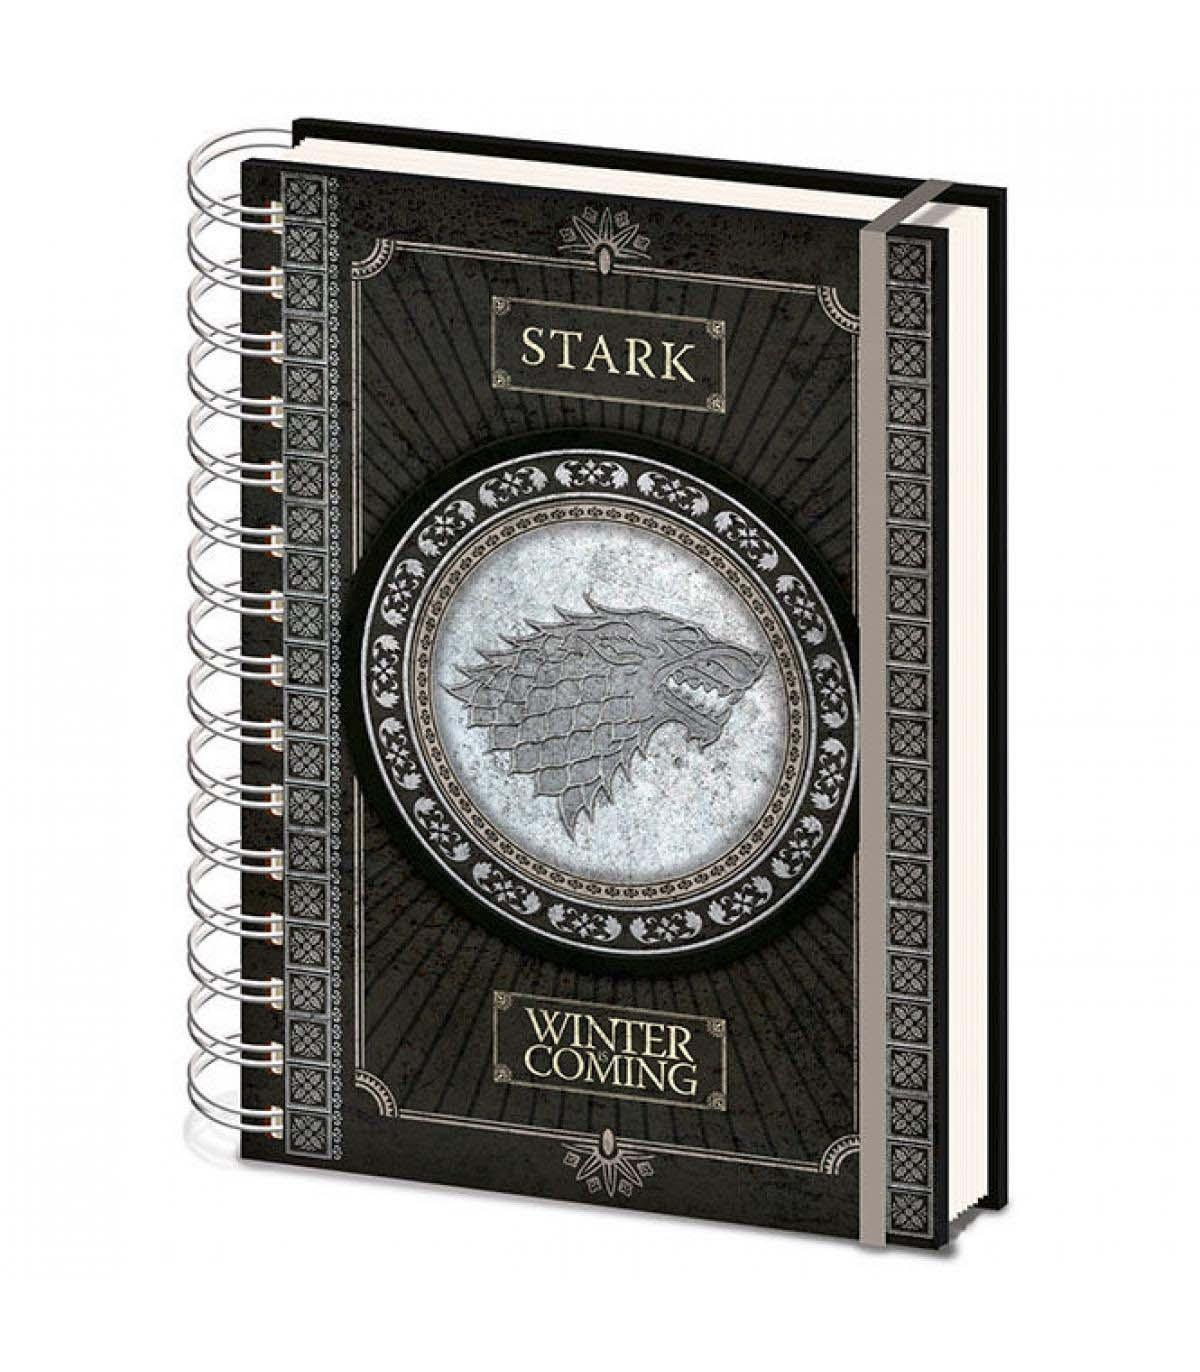 Cuaderno A5 Juego De Tronos Stark